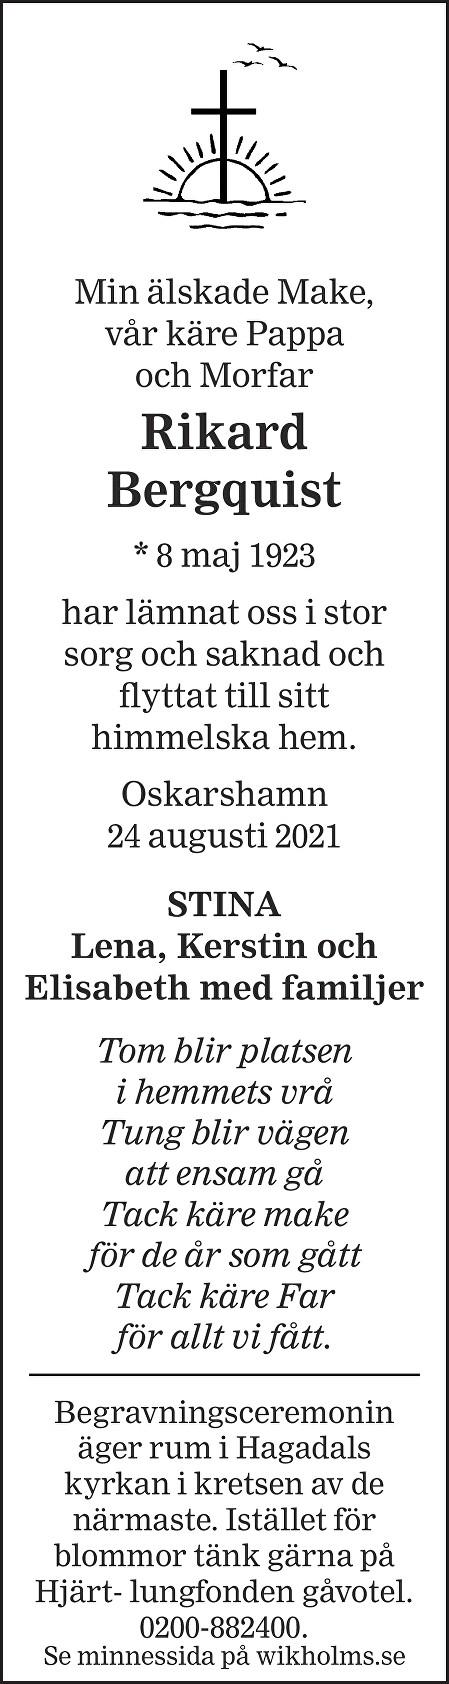 Rikard Bergqvist Death notice